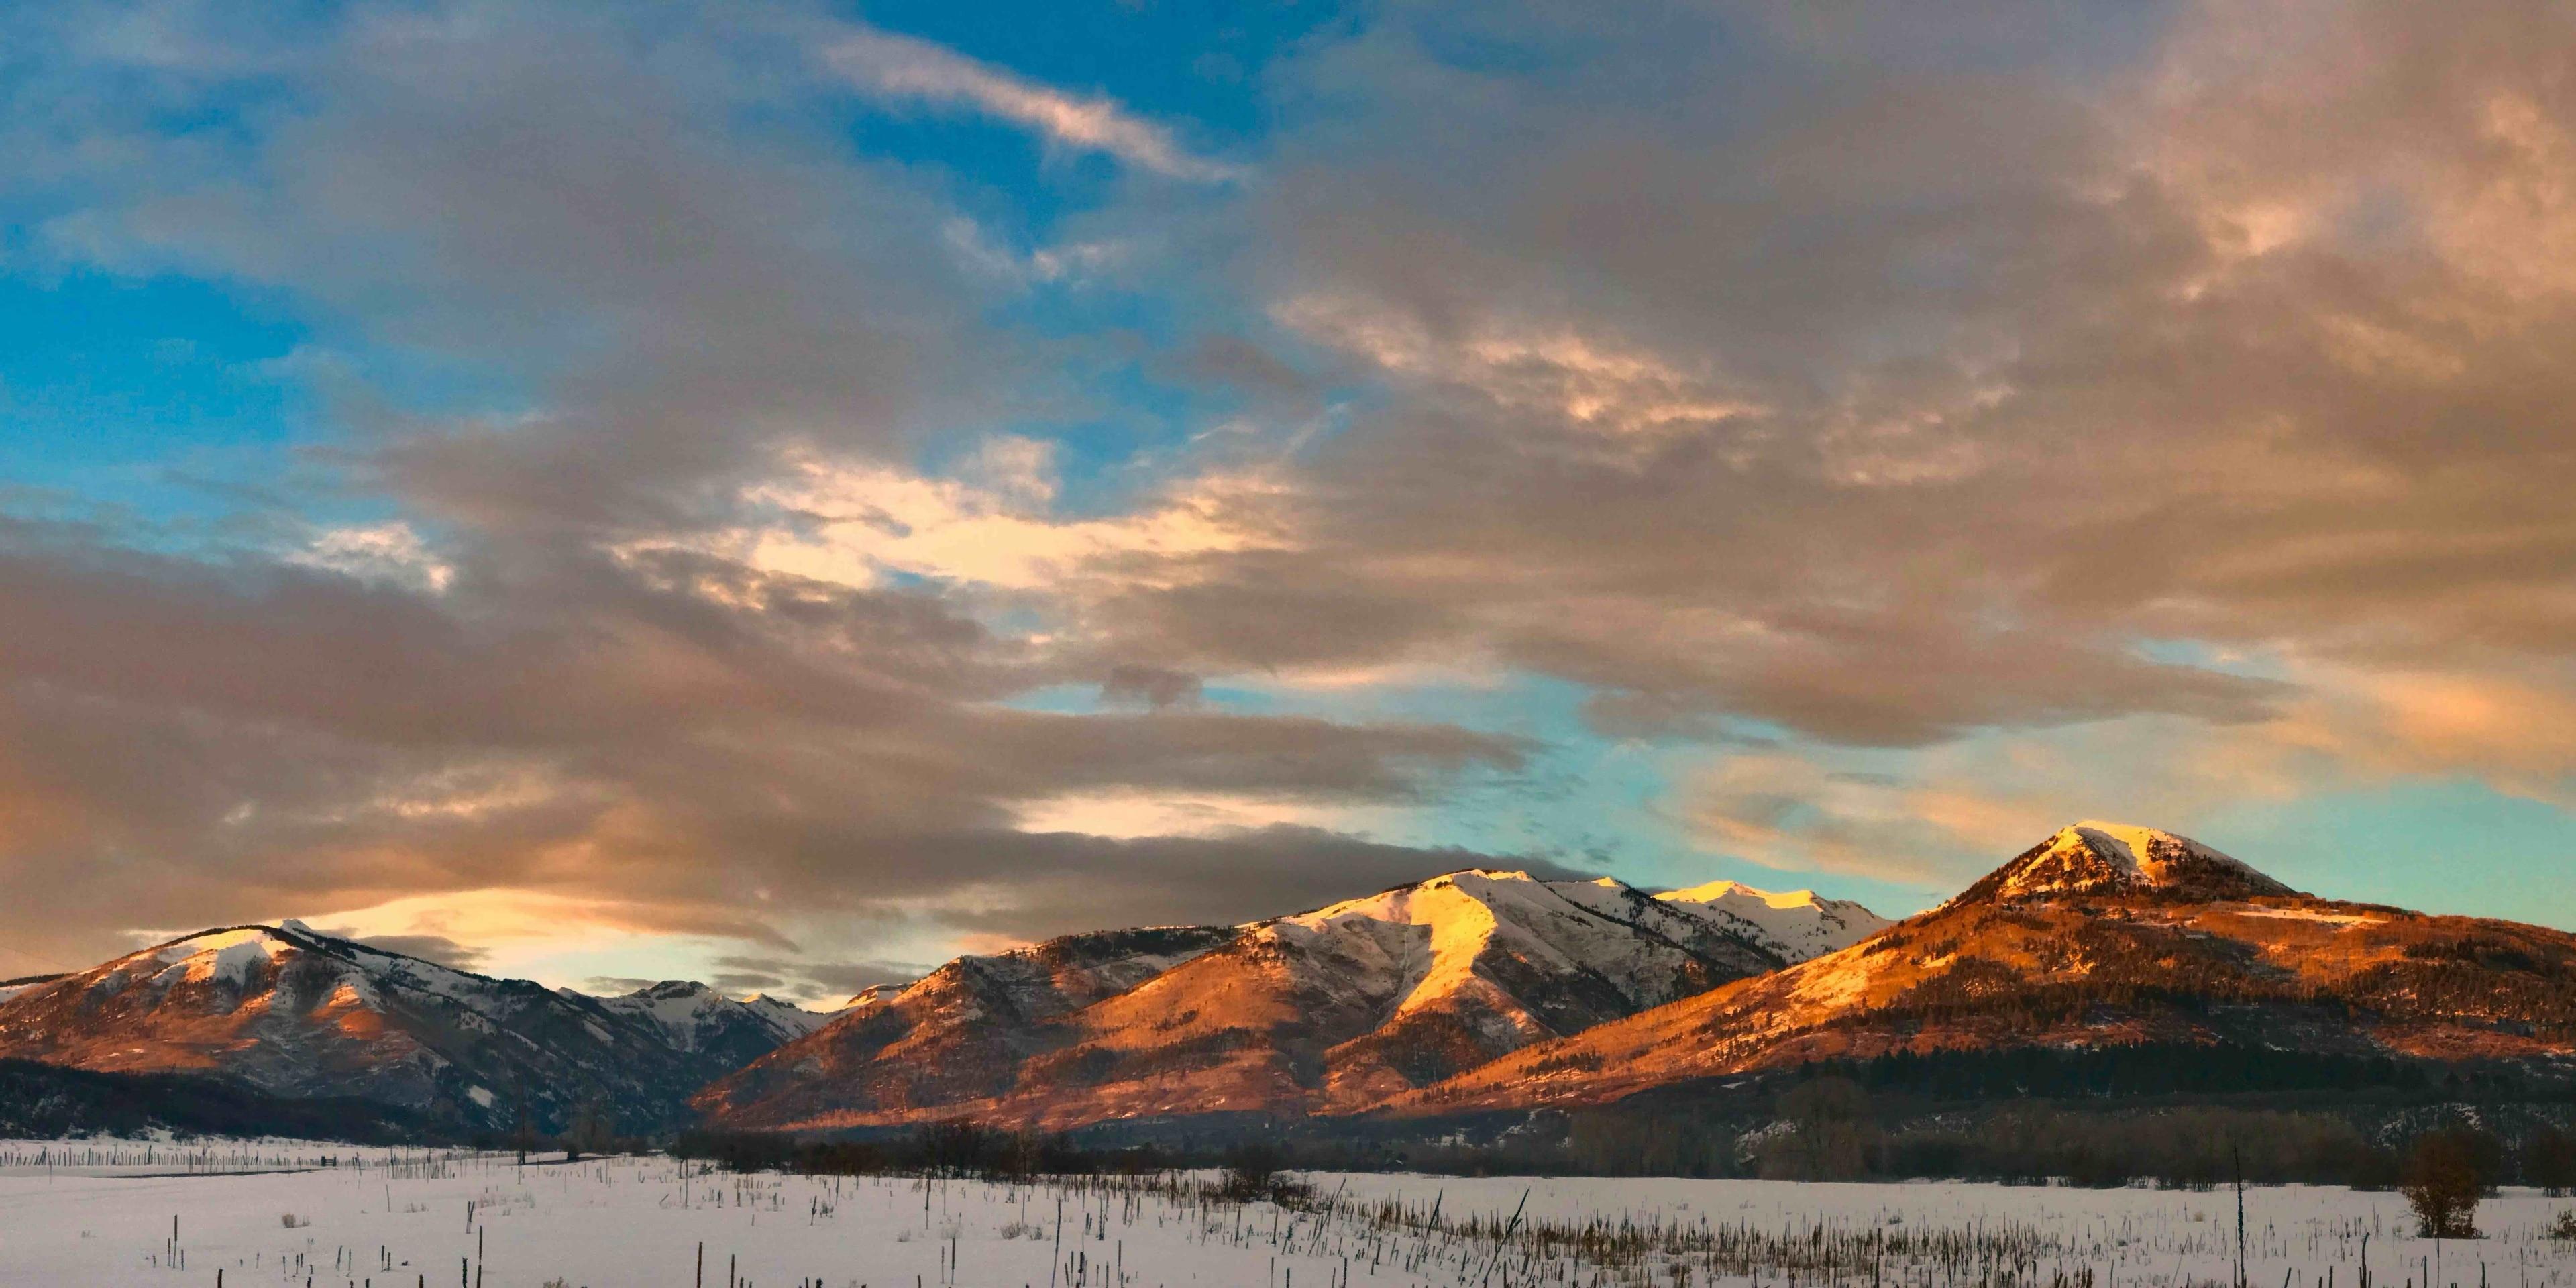 Hesperus, Colorado, United States of America